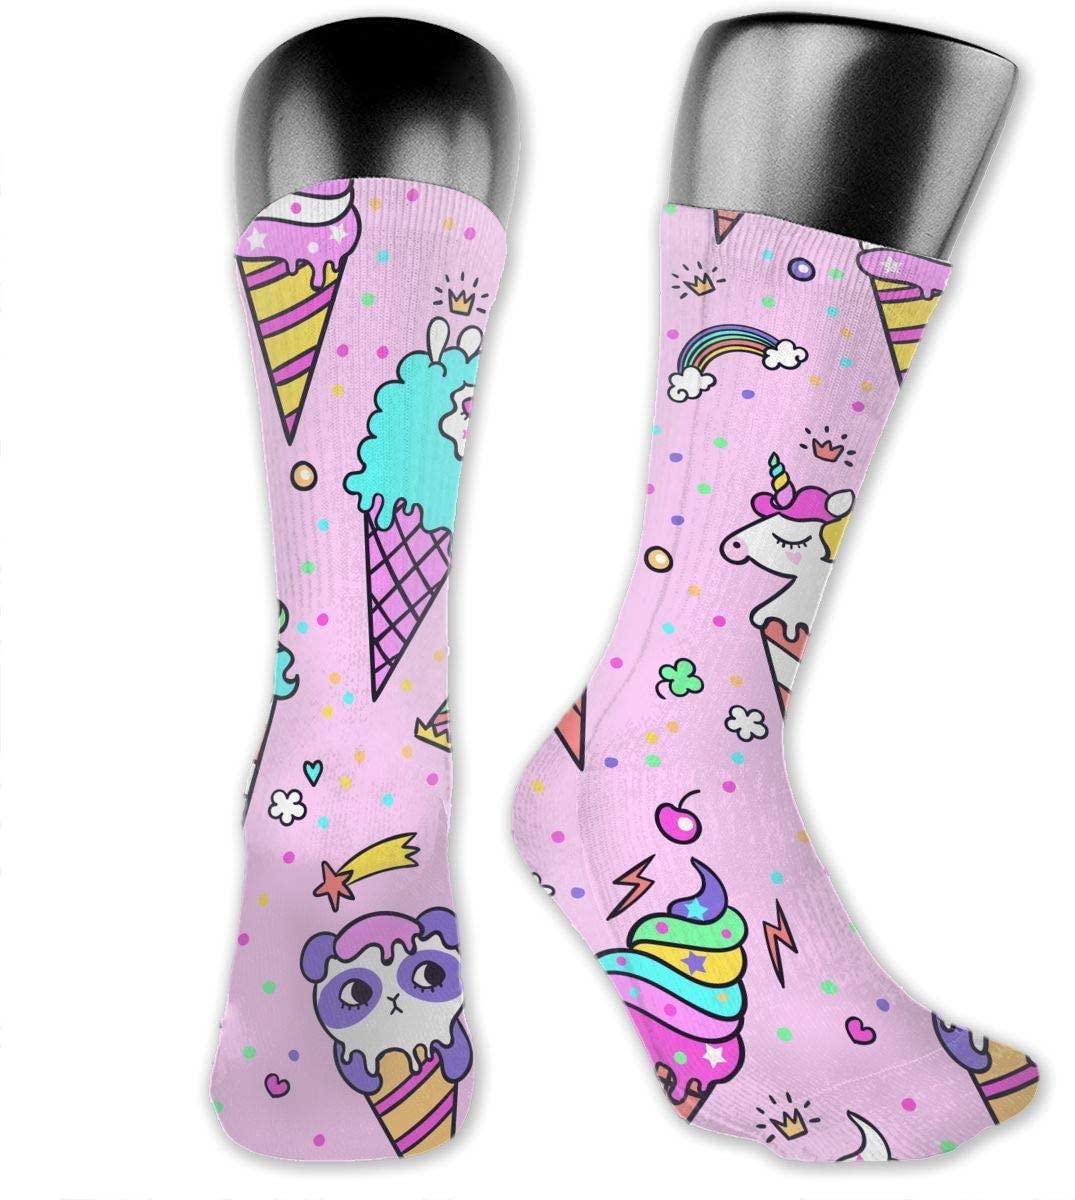 Ice Cream Unicorn Unisex Outdoor Long Socks Sport Athletic Crew Socks Stockings